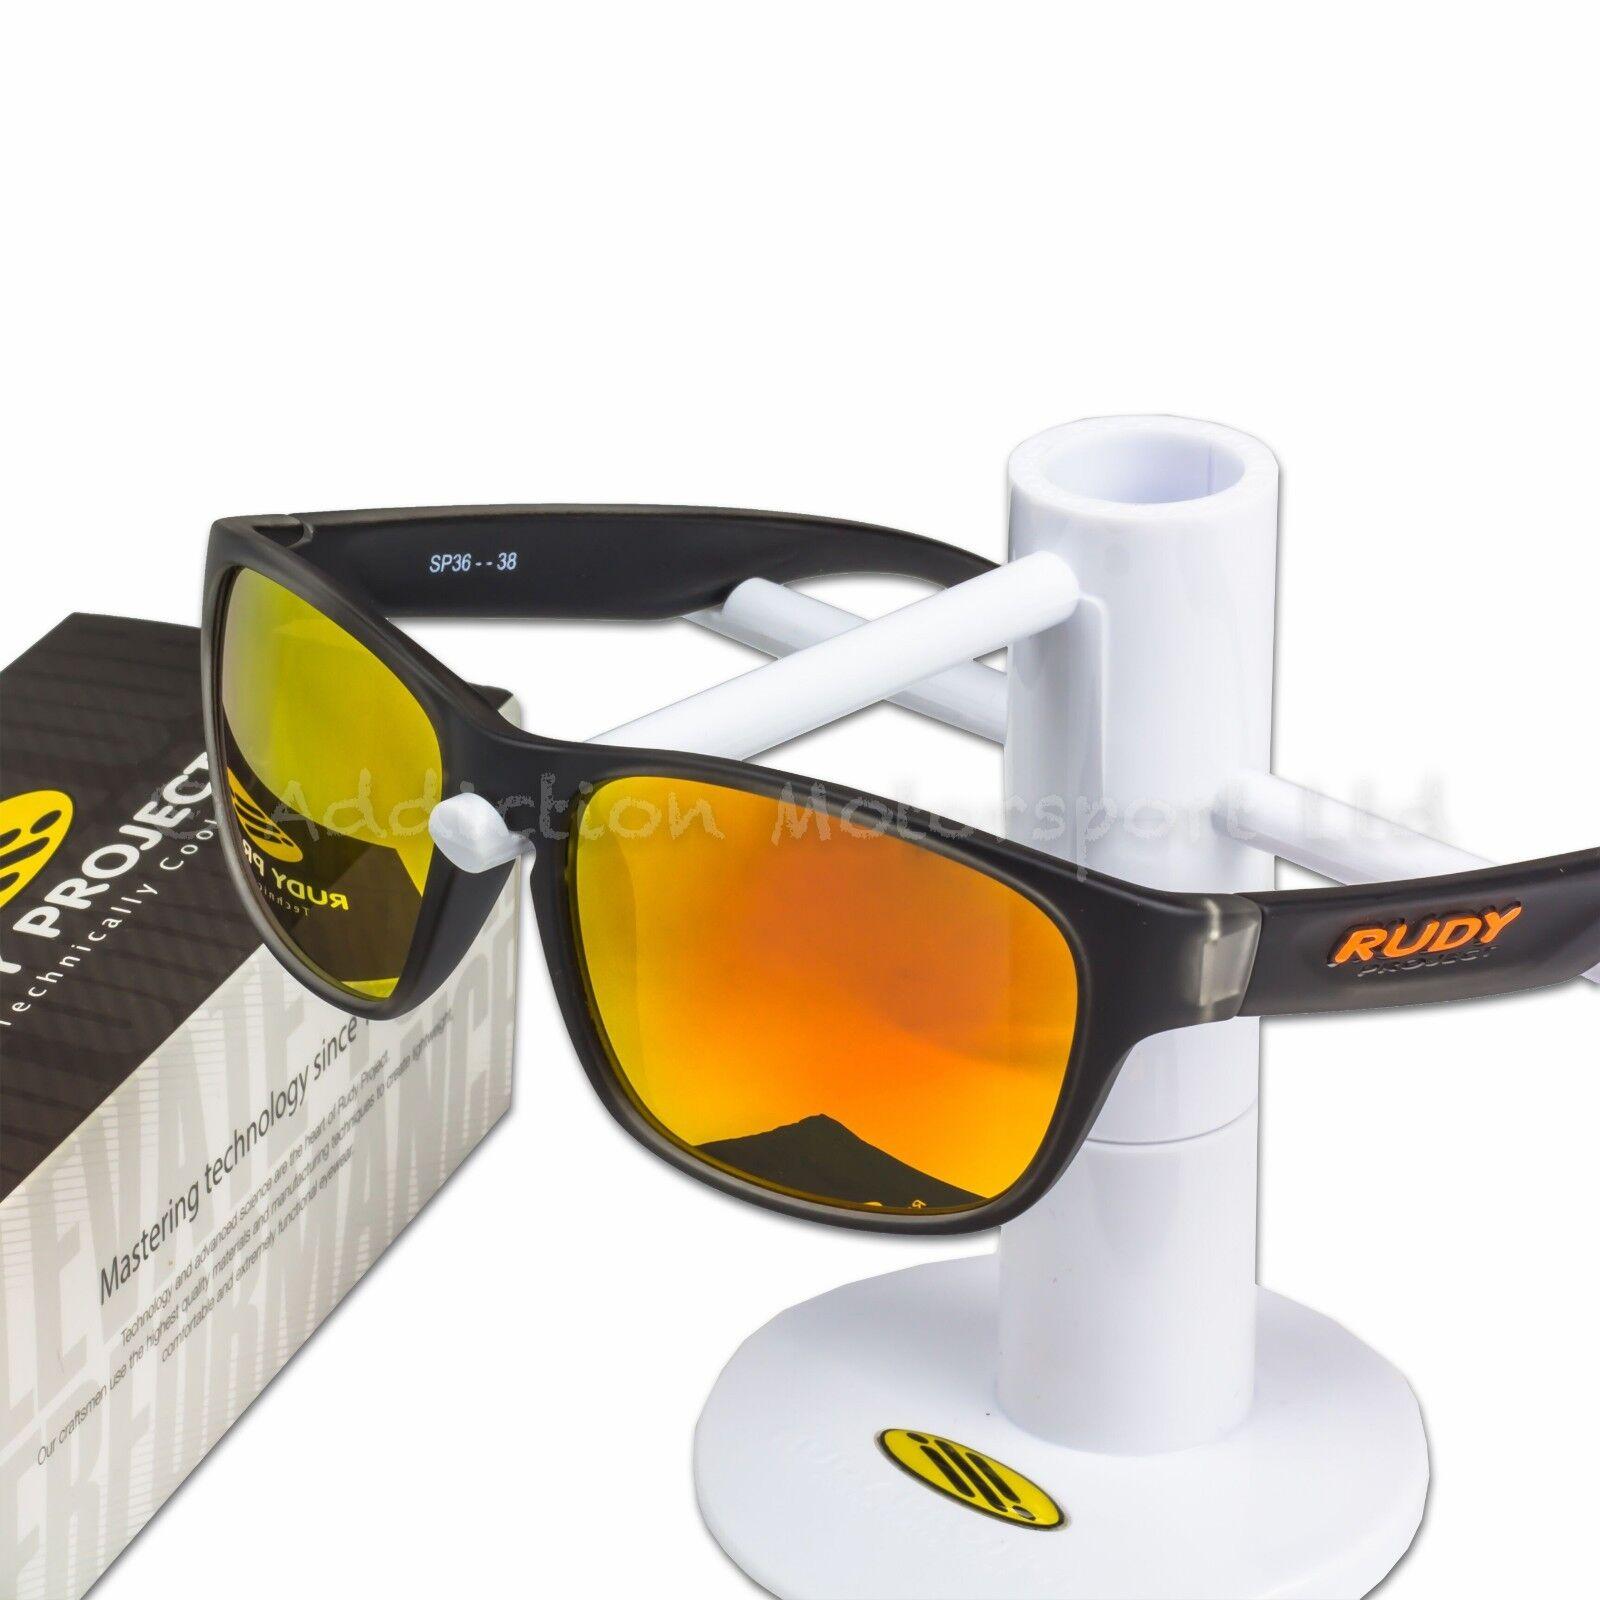 Sp364038 Glass Details About Orange Iceblack Rudy Project SunglassesSensor Mls Lifestyle L4A35Rj